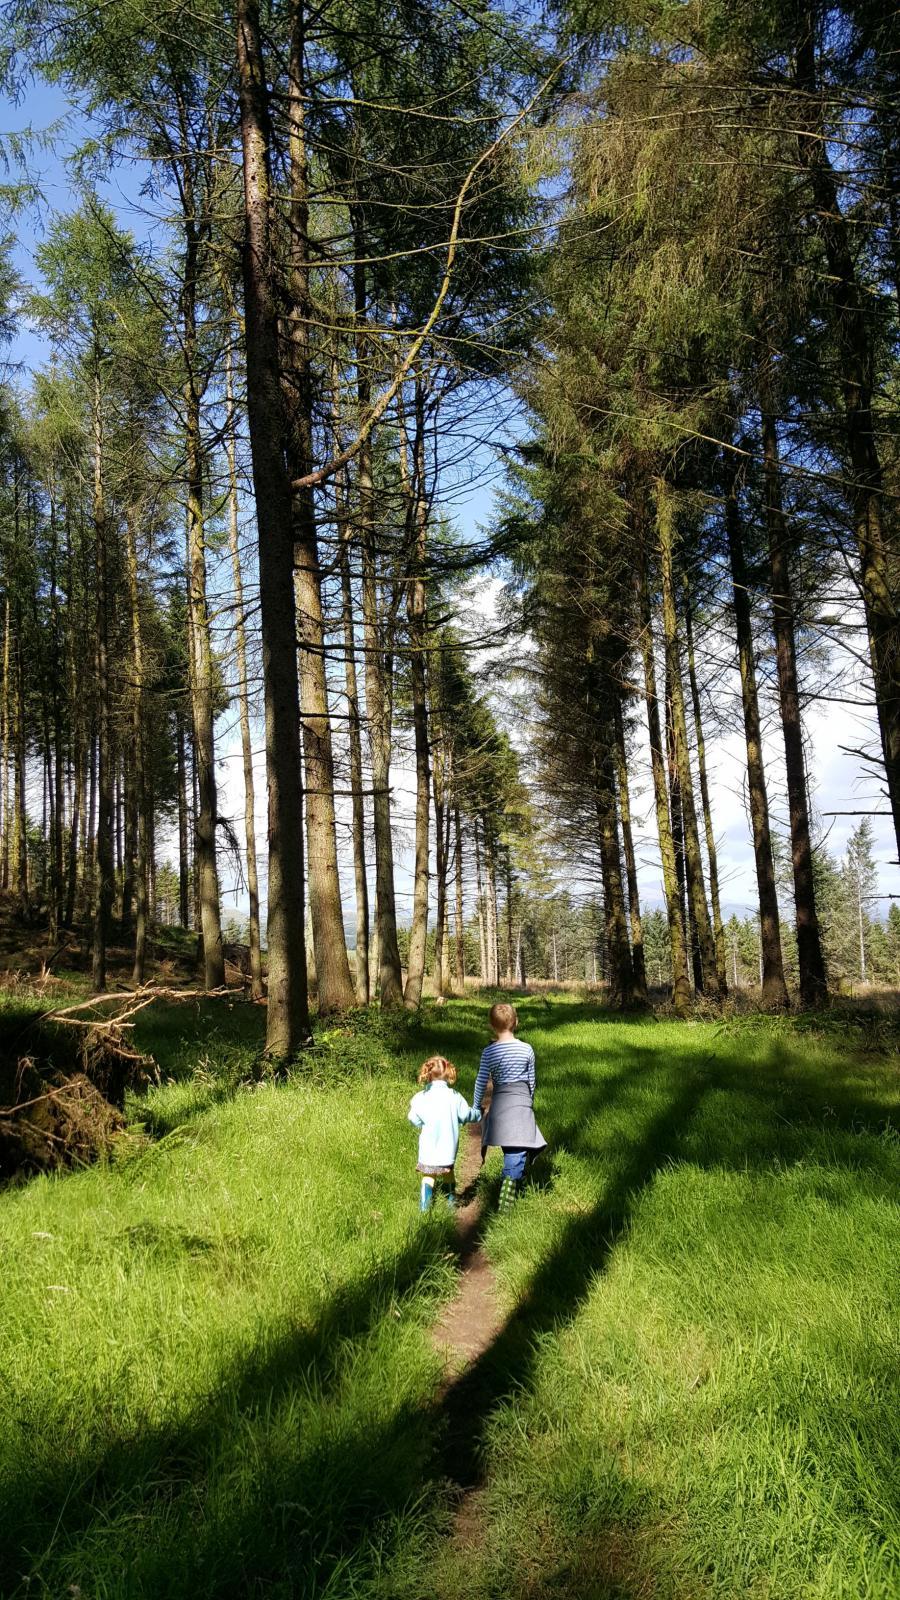 #LivingArrows – Our Woodland Walk